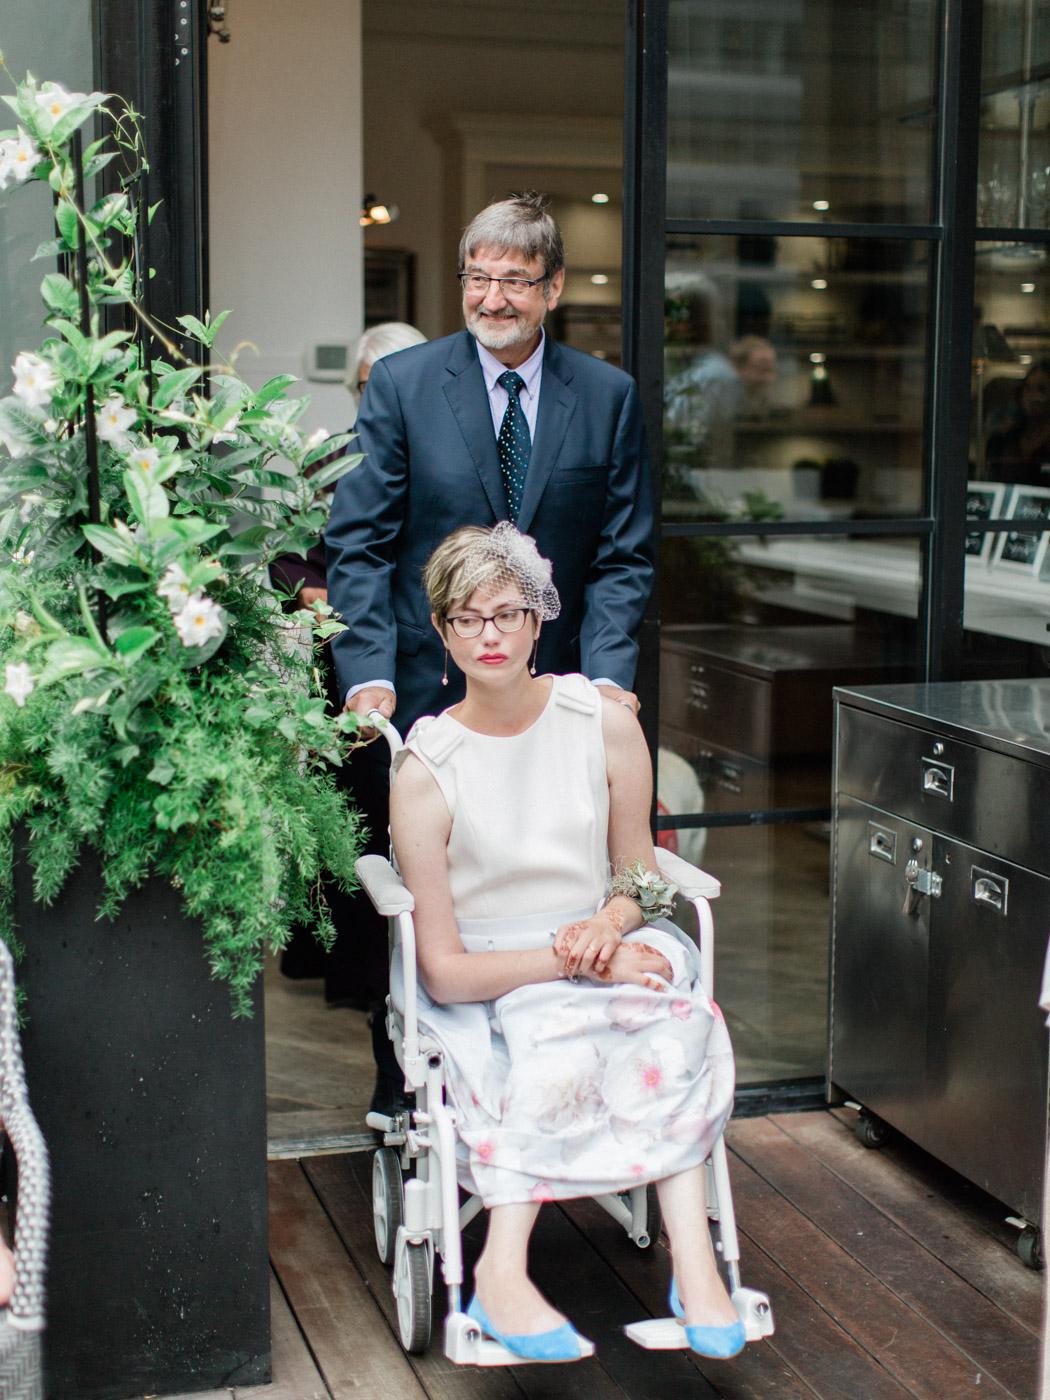 Toronto-wedding-photographer-intimate-restaurant-elopement-chase-oyster-downtown26.jpg